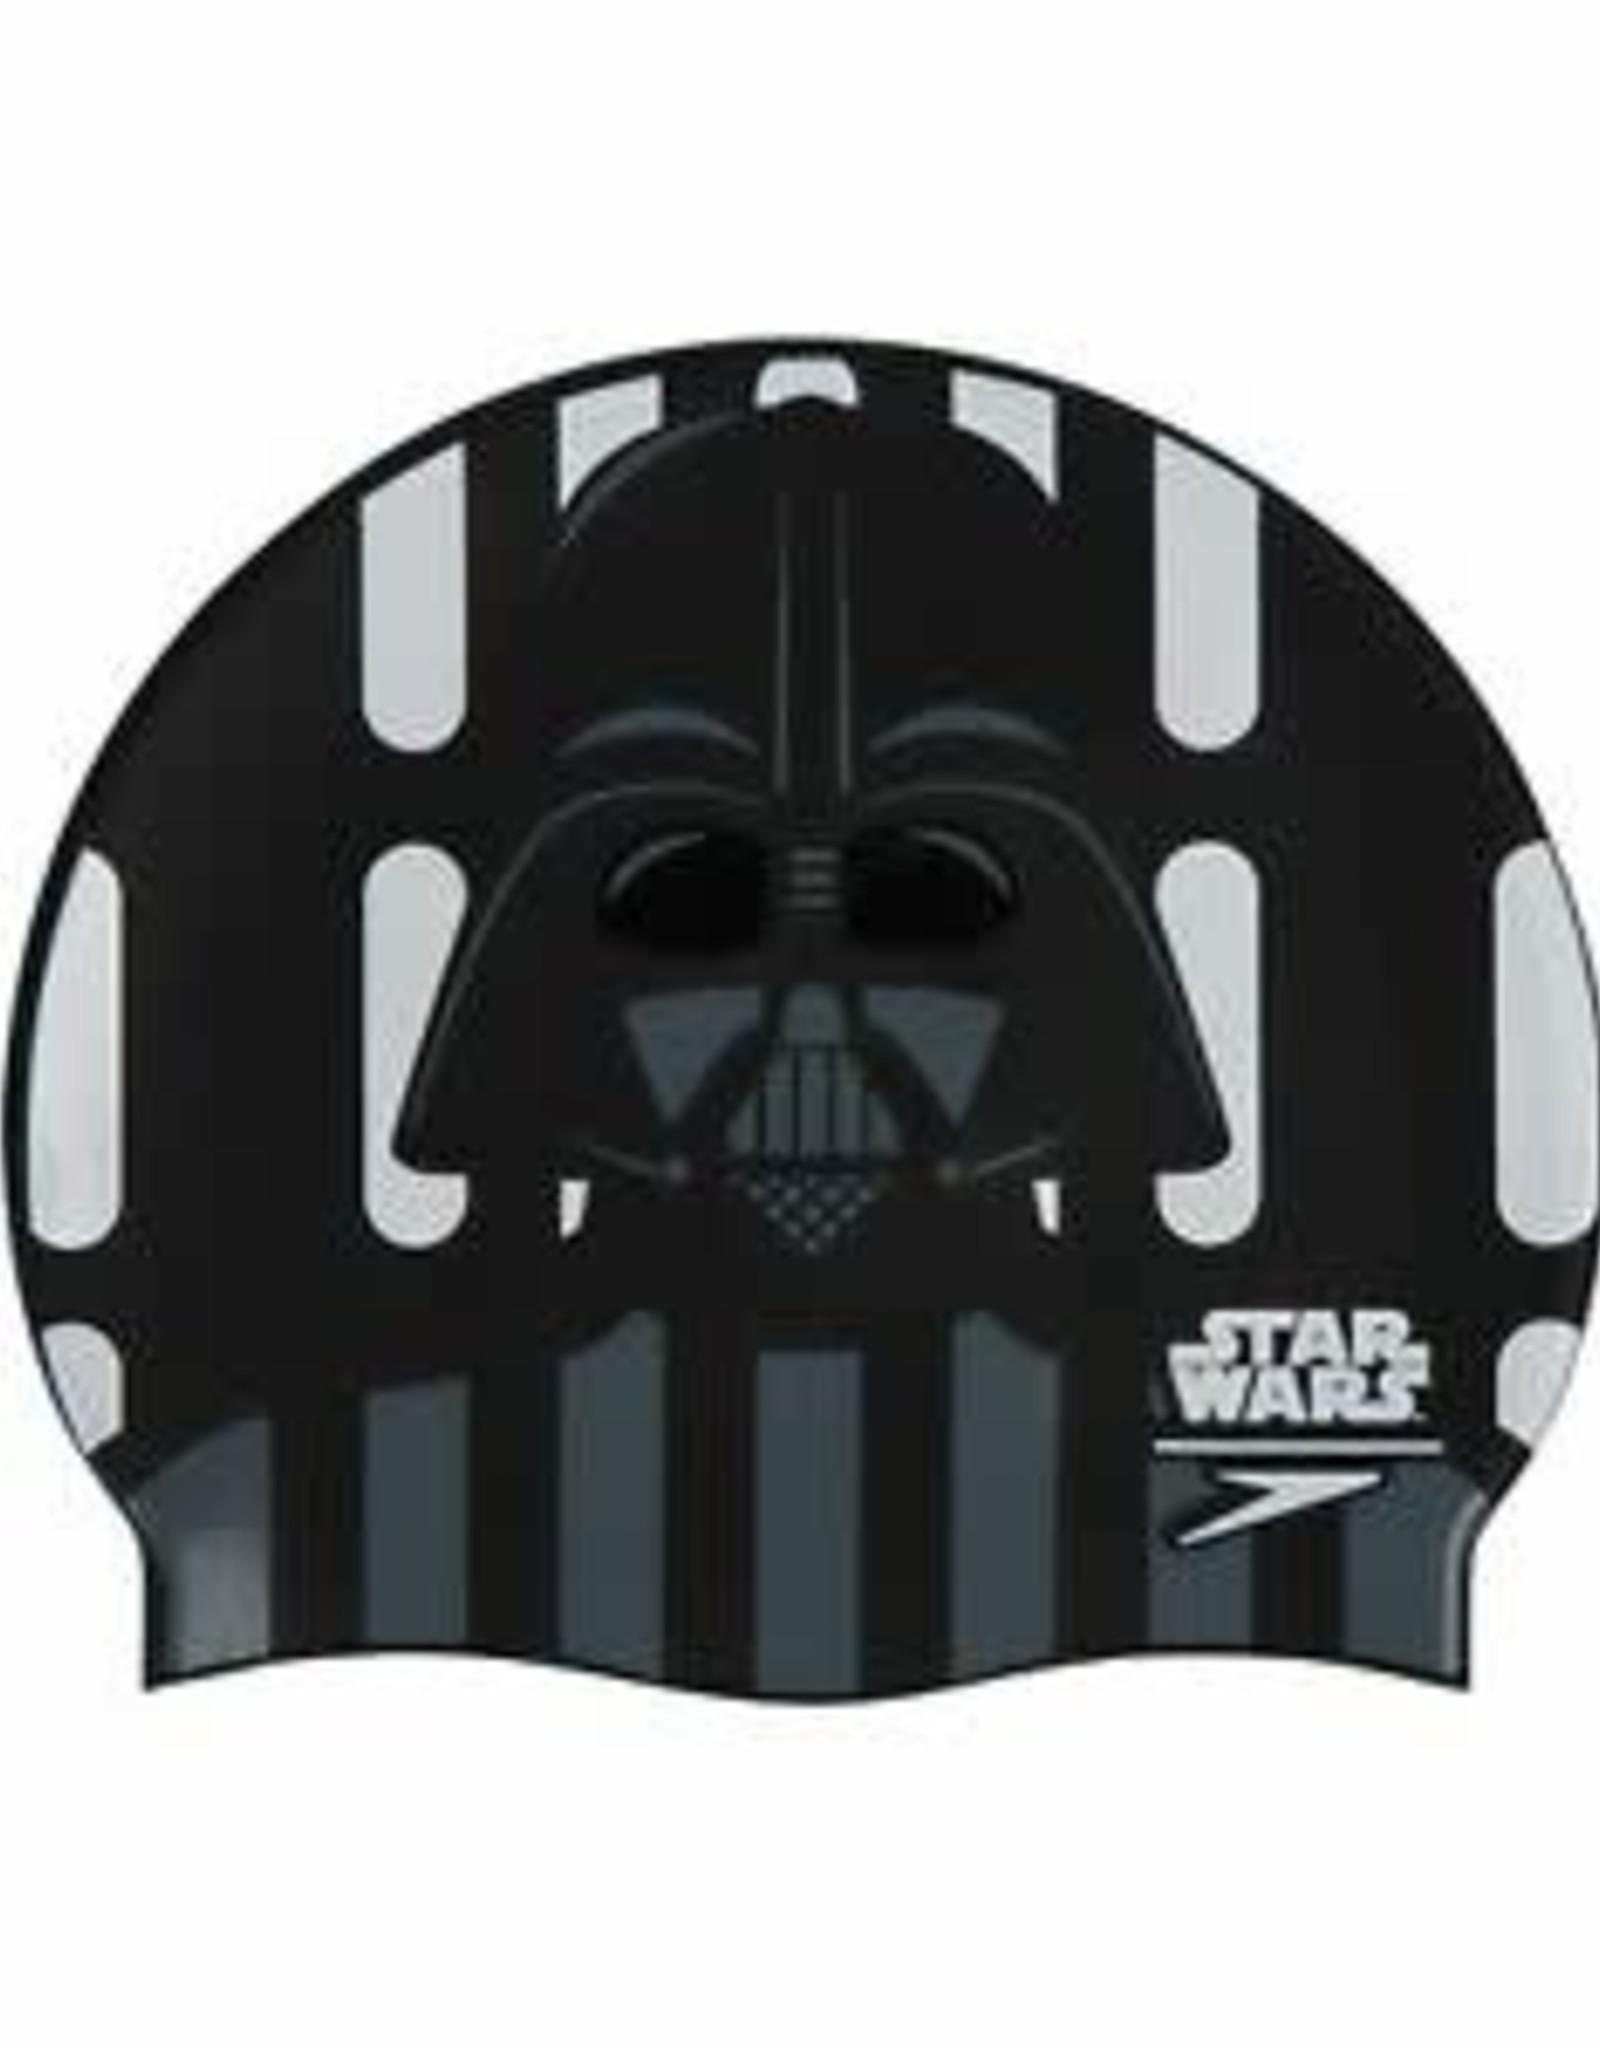 Speedo Swimcaps moulded silicone cap - Star Wars Darth vader